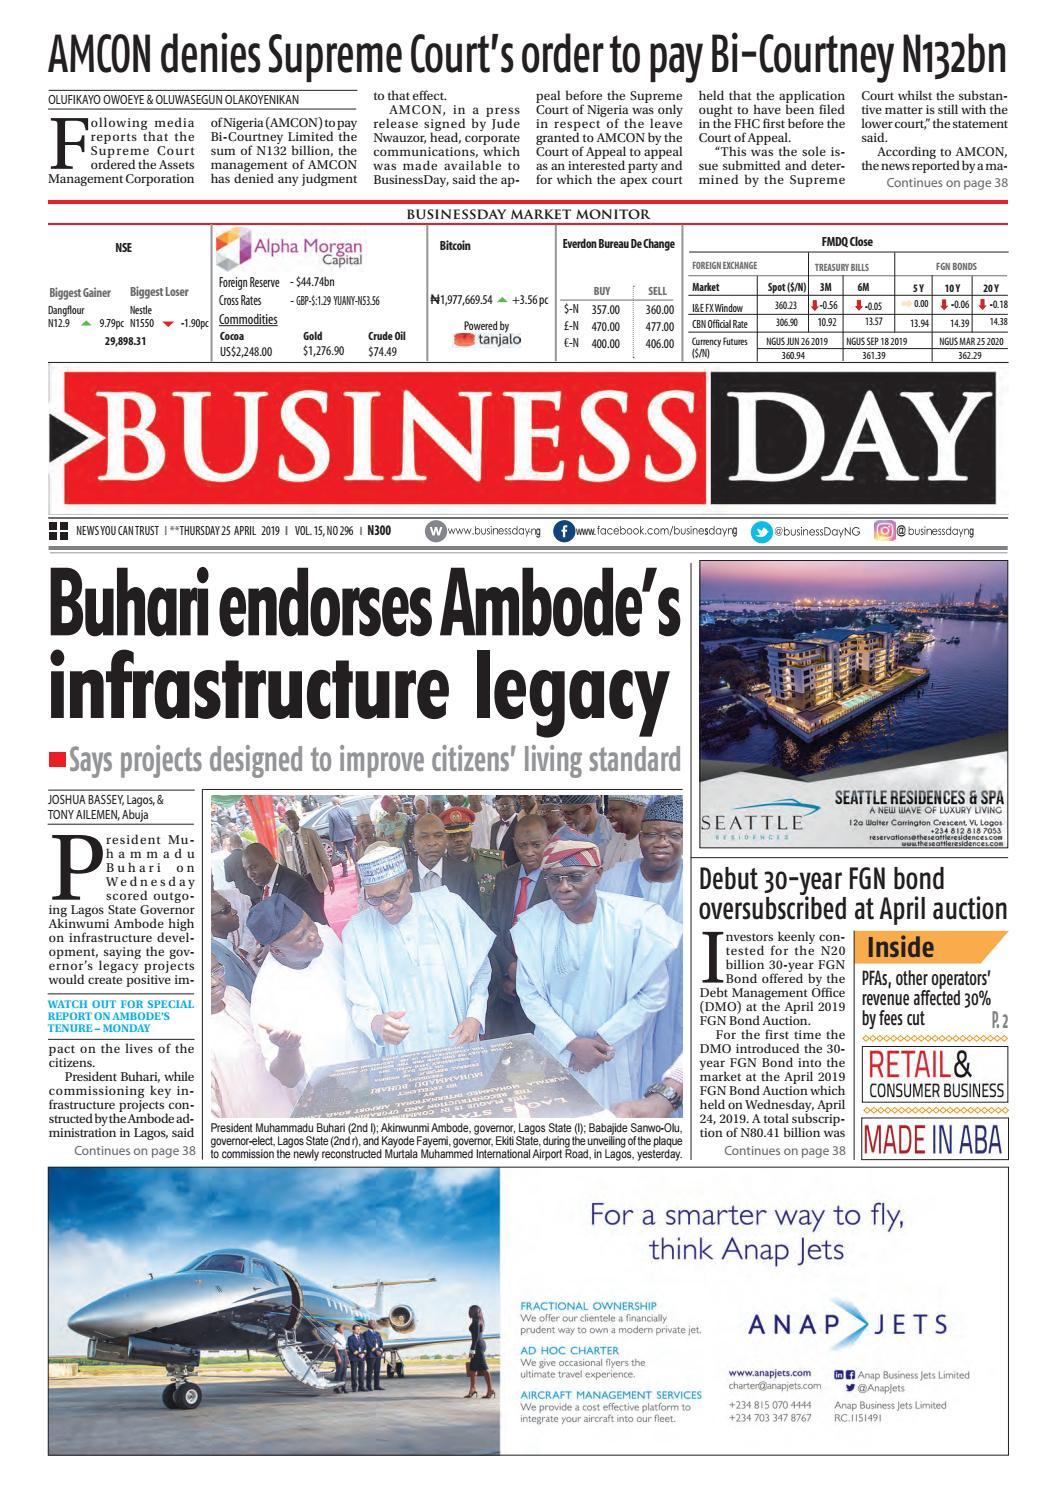 BusinessDay 25 Apr 2019 by BusinessDay - issuu